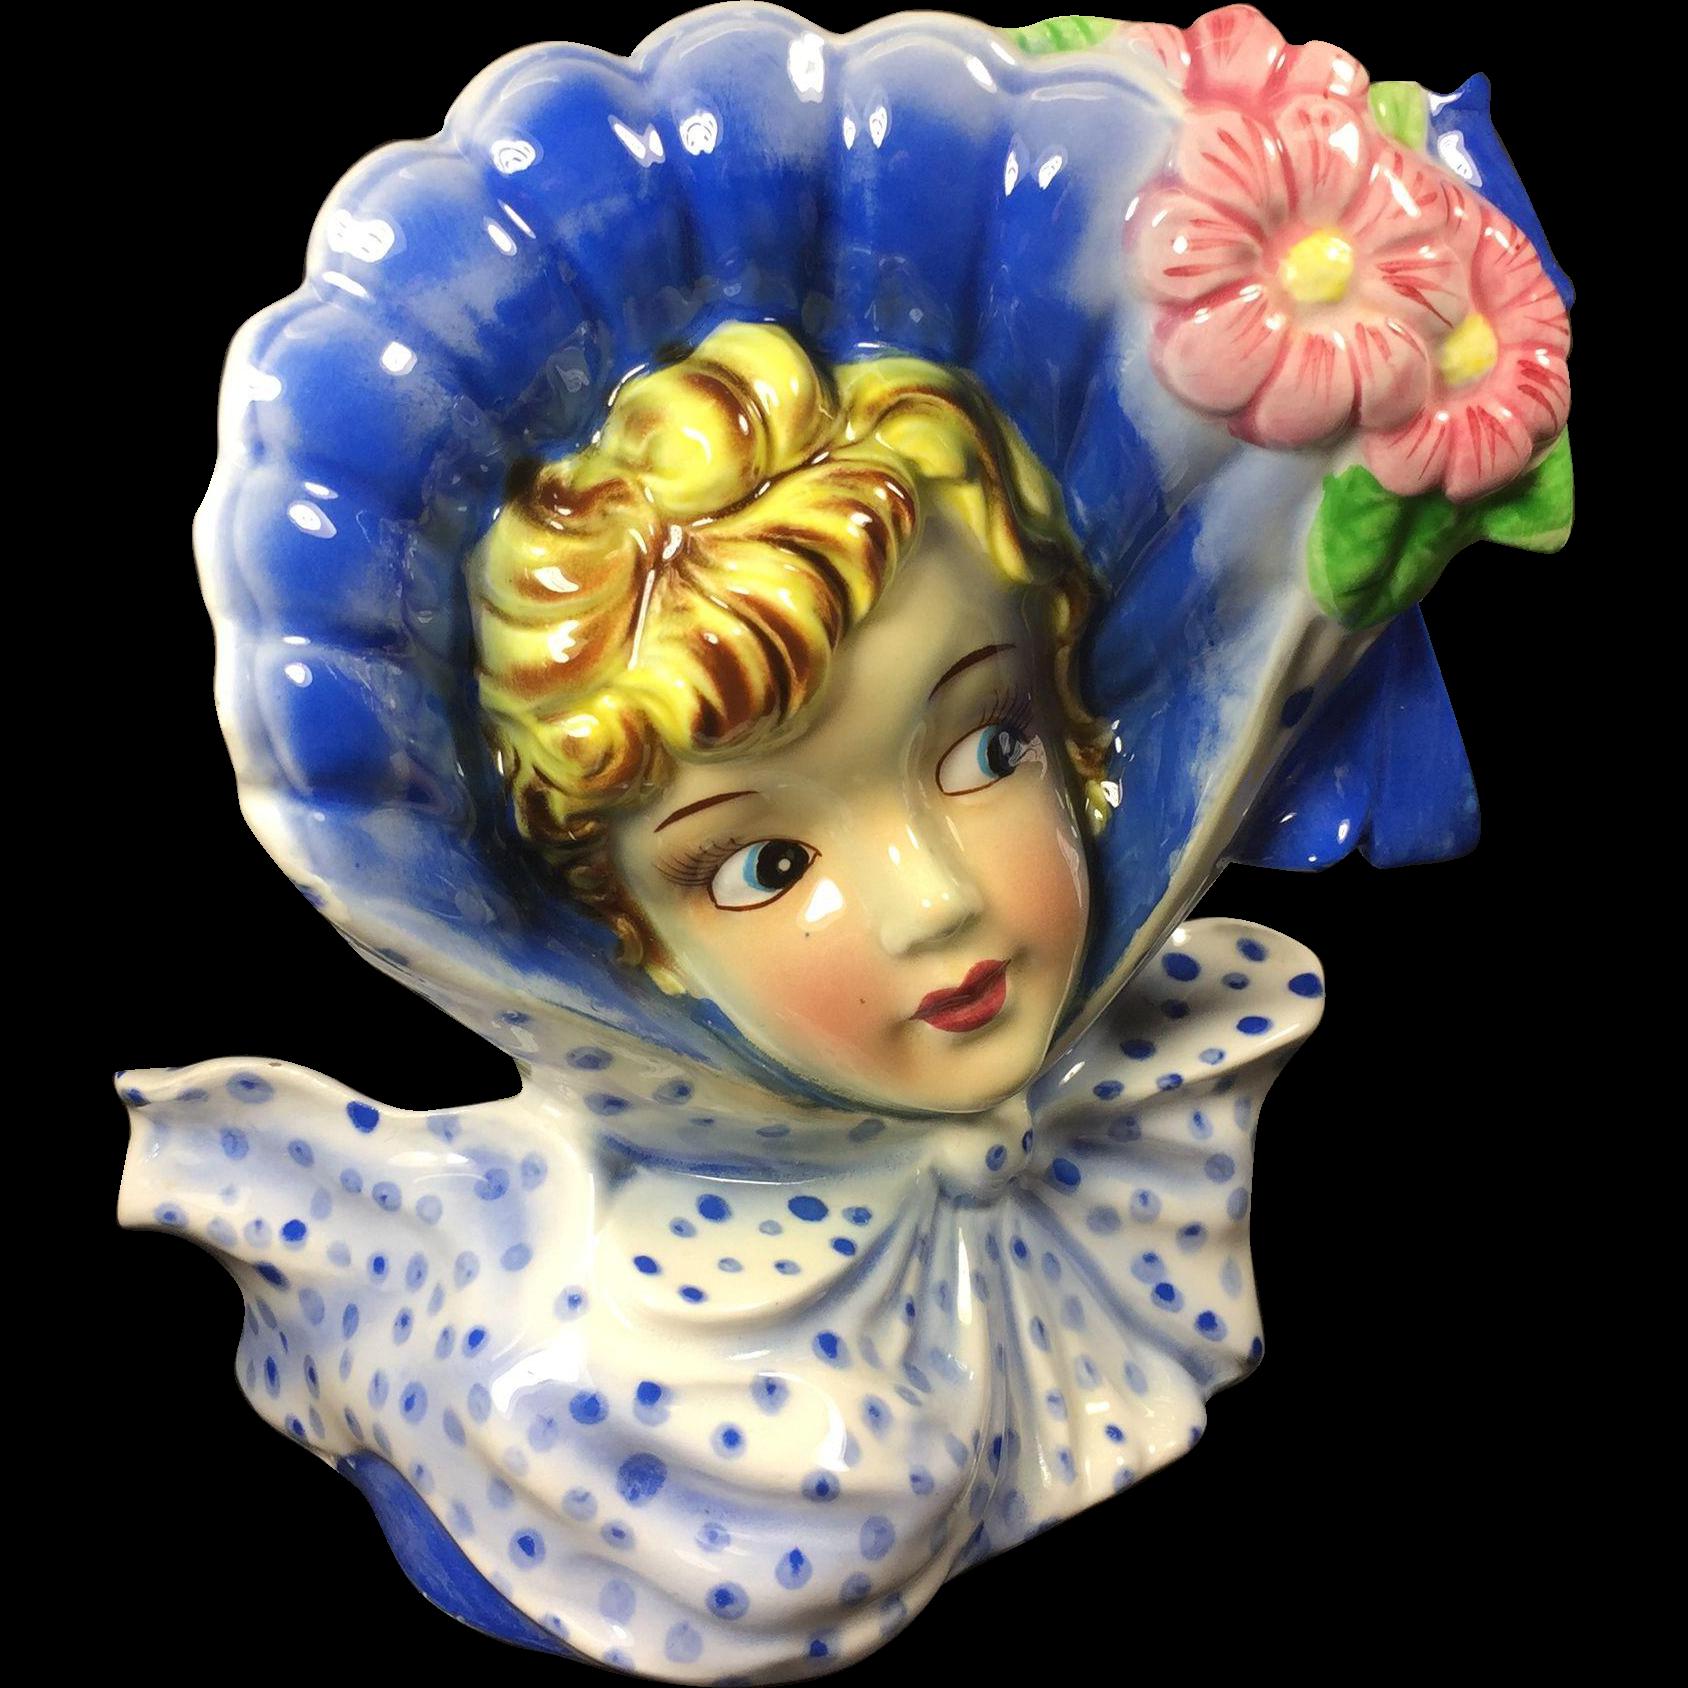 Vintage Lady Head Vase w Huge Bonnet & Polka-Dot Neck Bow